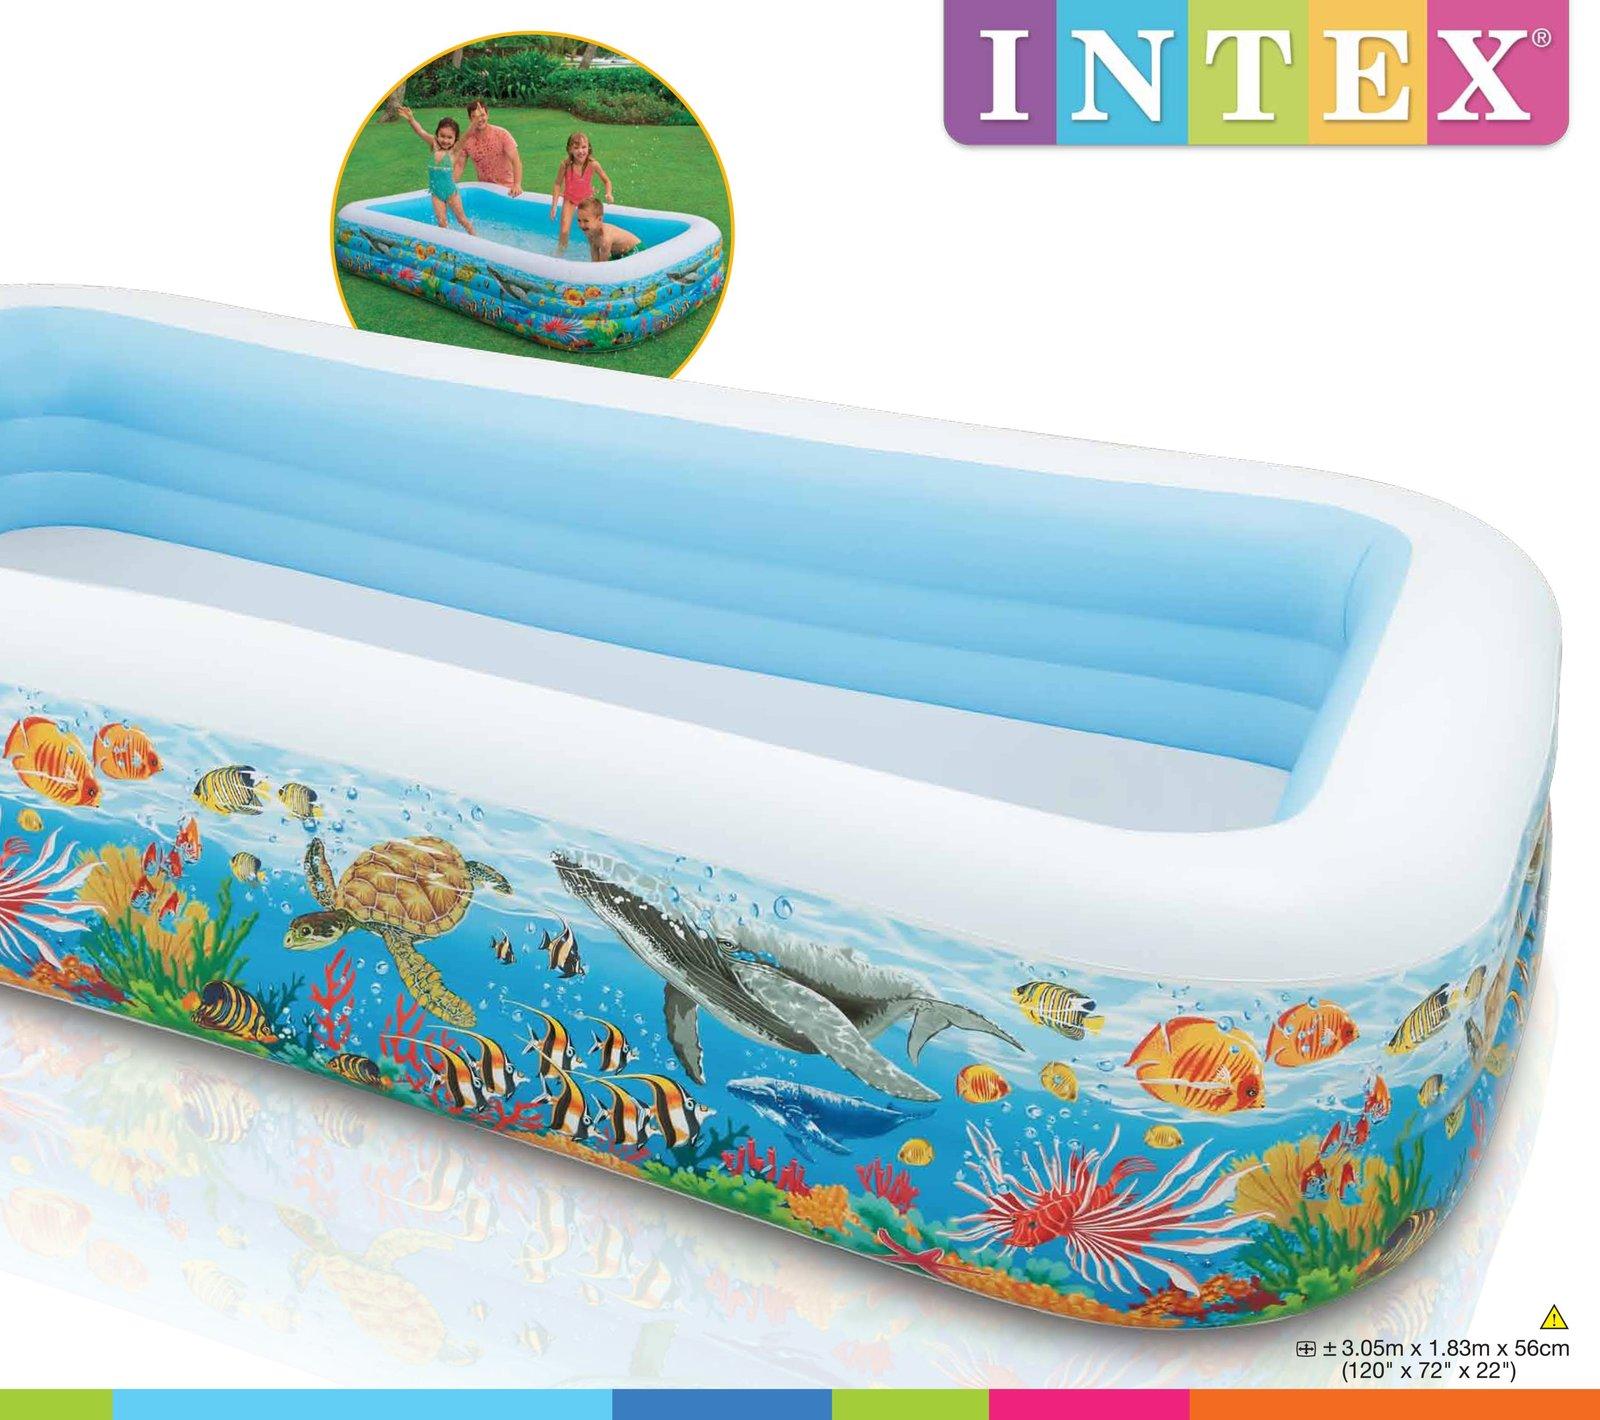 Intex Swim Center Tropical Reef Family Pool Toy At Mighty Ape Australia